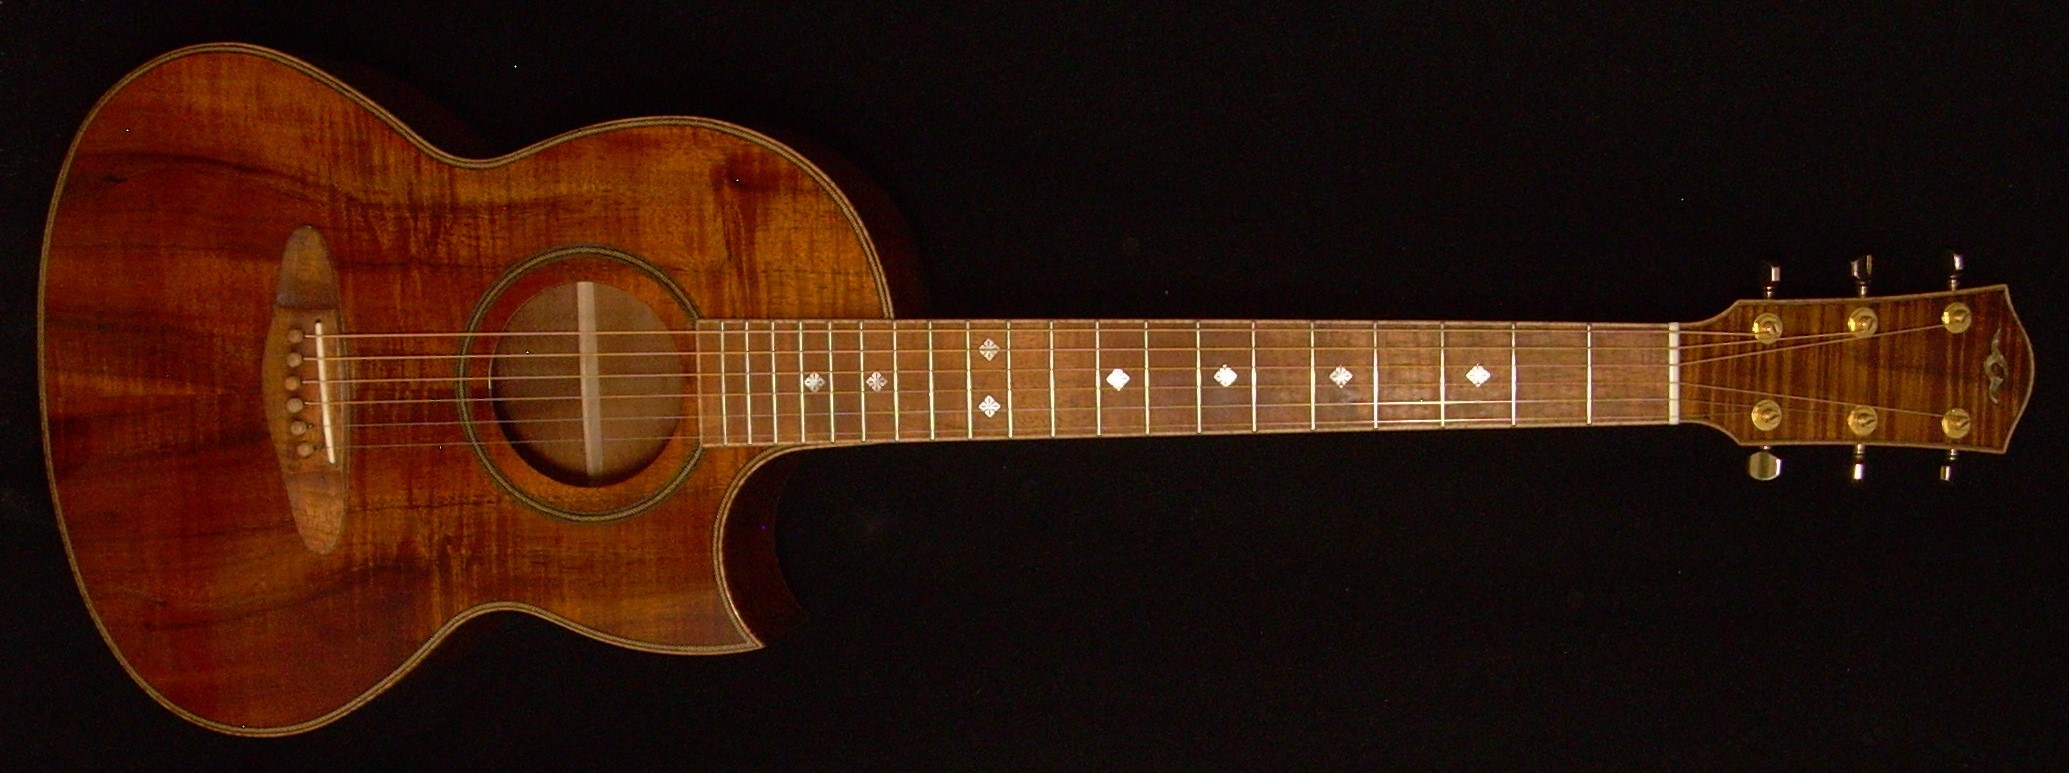 Art Davis Guitars